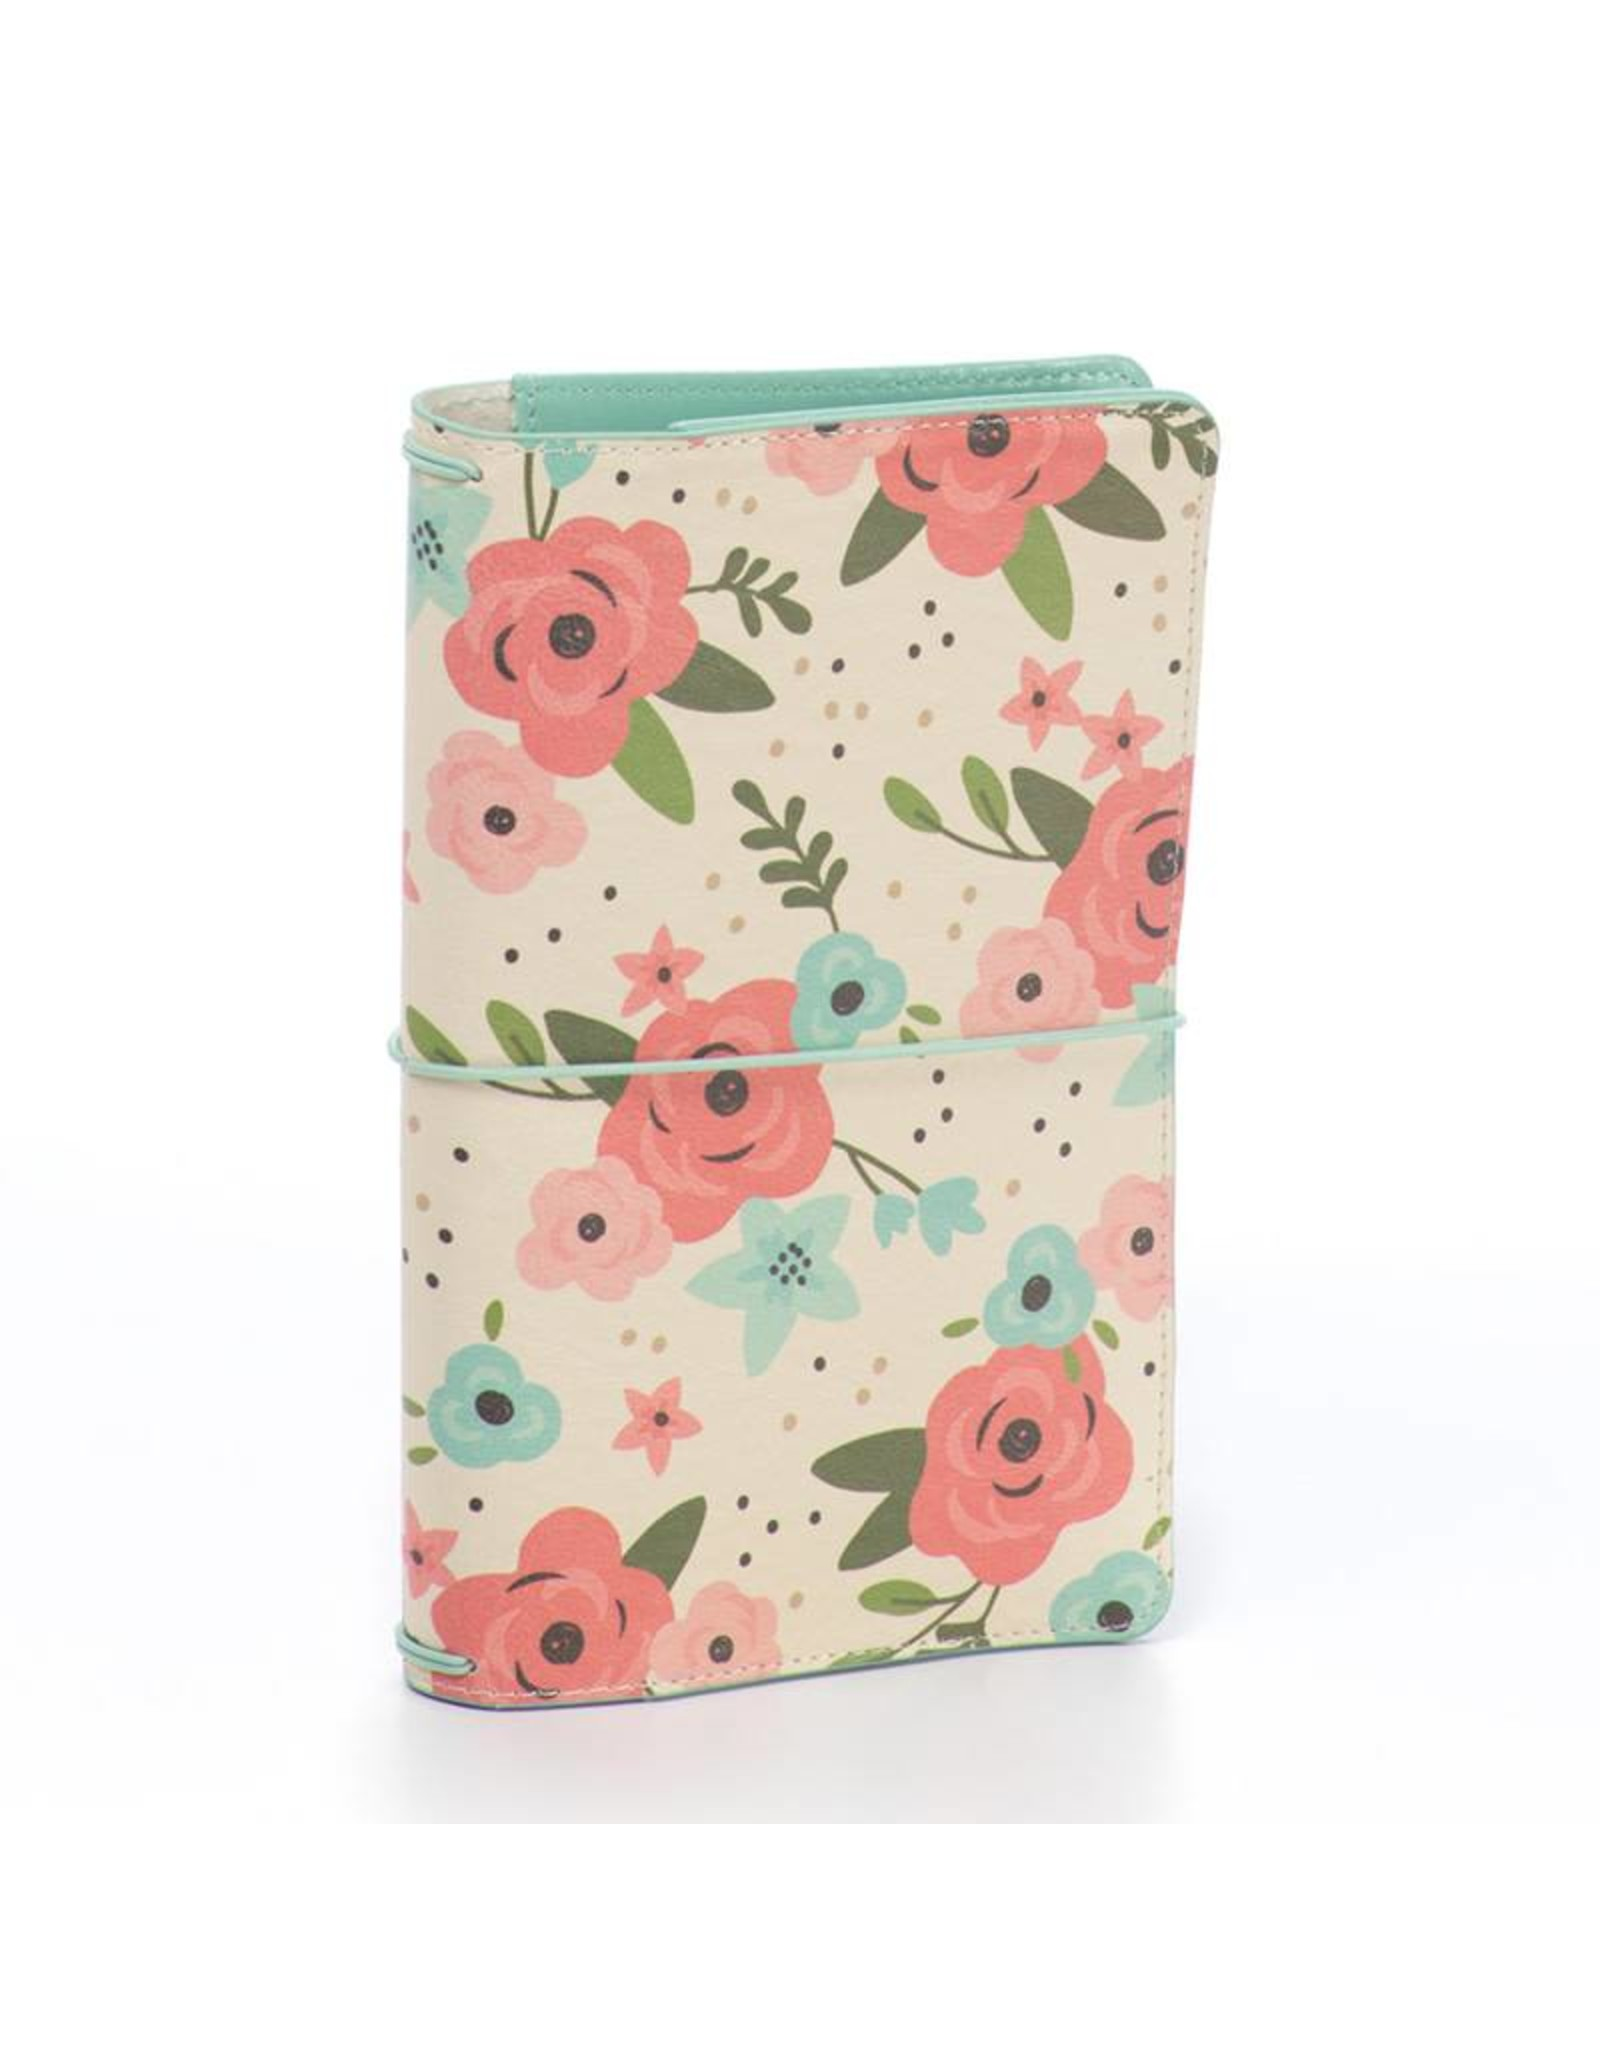 Carpe Diem Carpe Diem Cream Blossom Traveler's Notebook